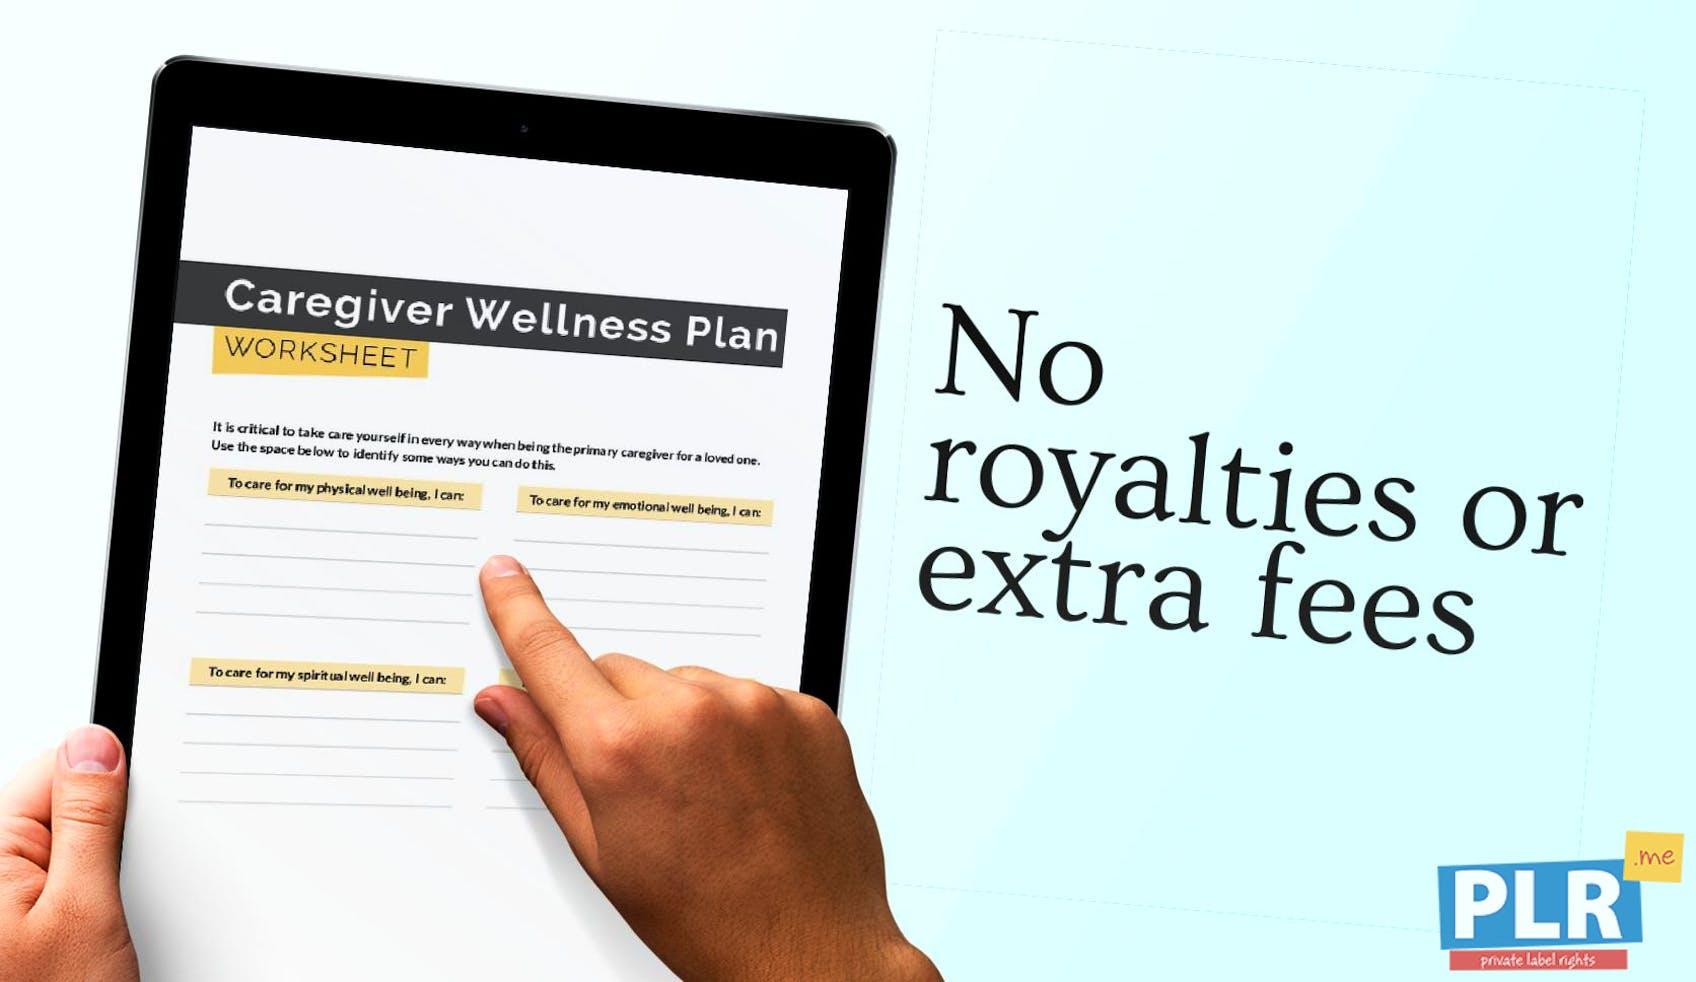 Caregiver Wellness Plan Worksheet